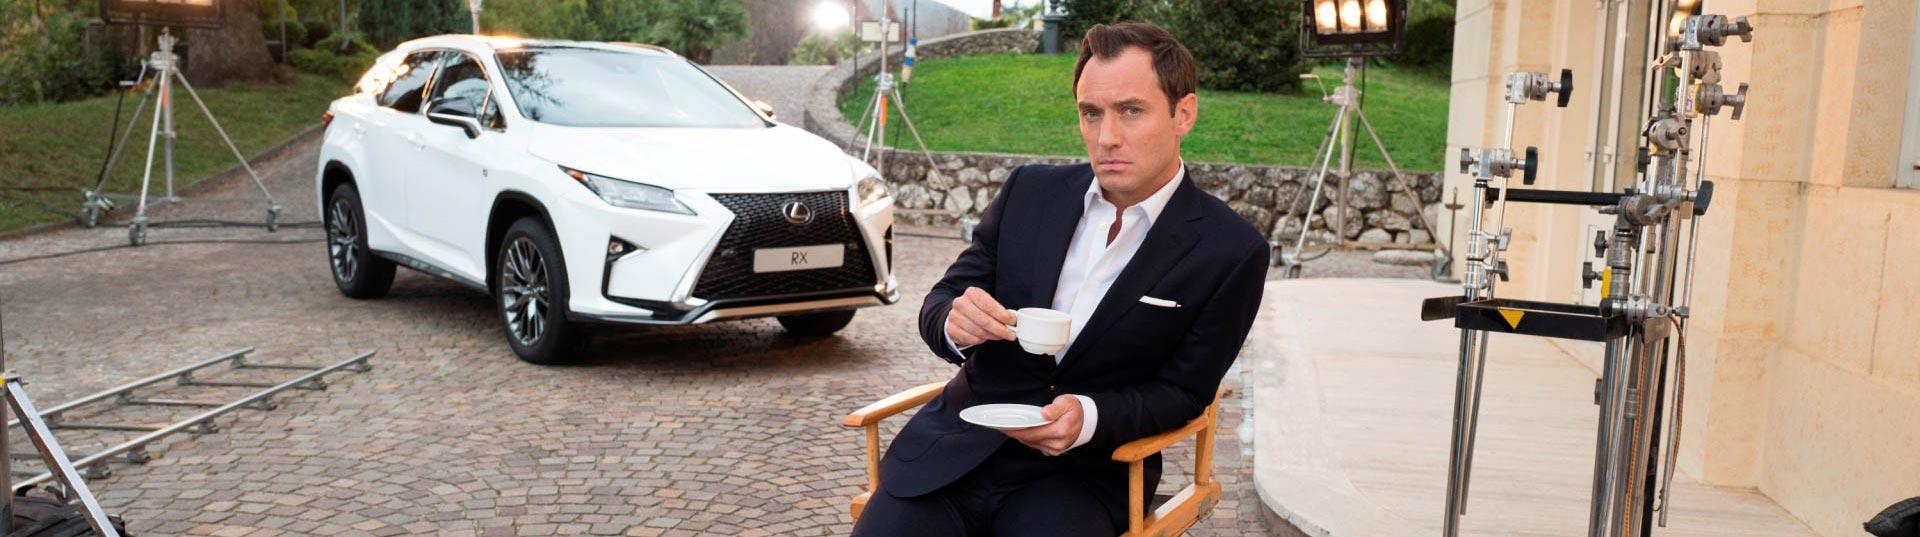 Jude Law e Lexus